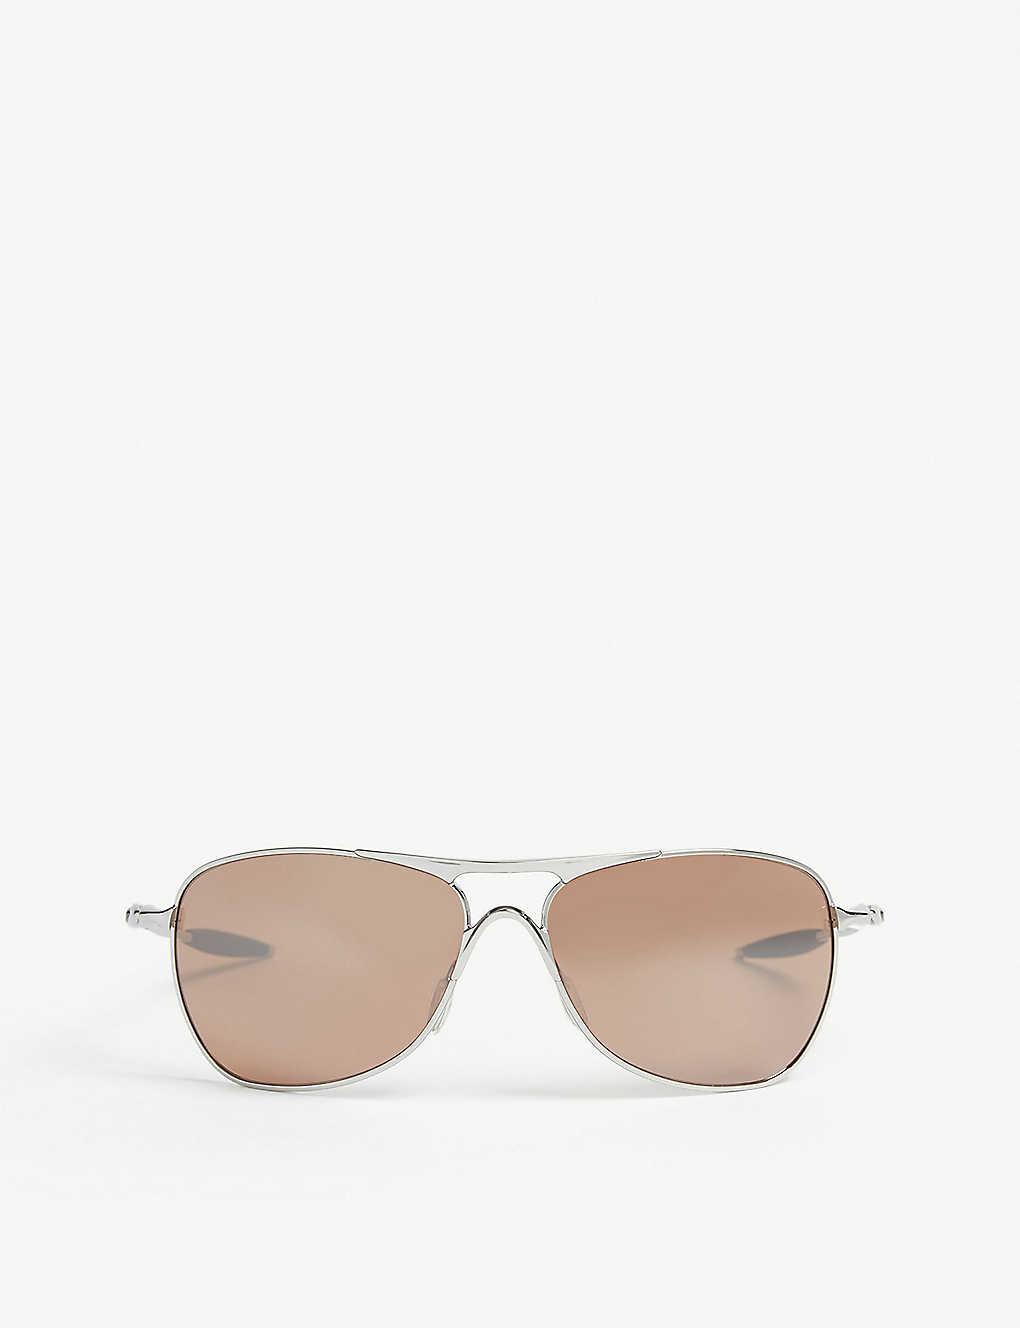 9532b347b9a5 OAKLEY - OO4060 Chrome square sunglasses | Selfridges.com